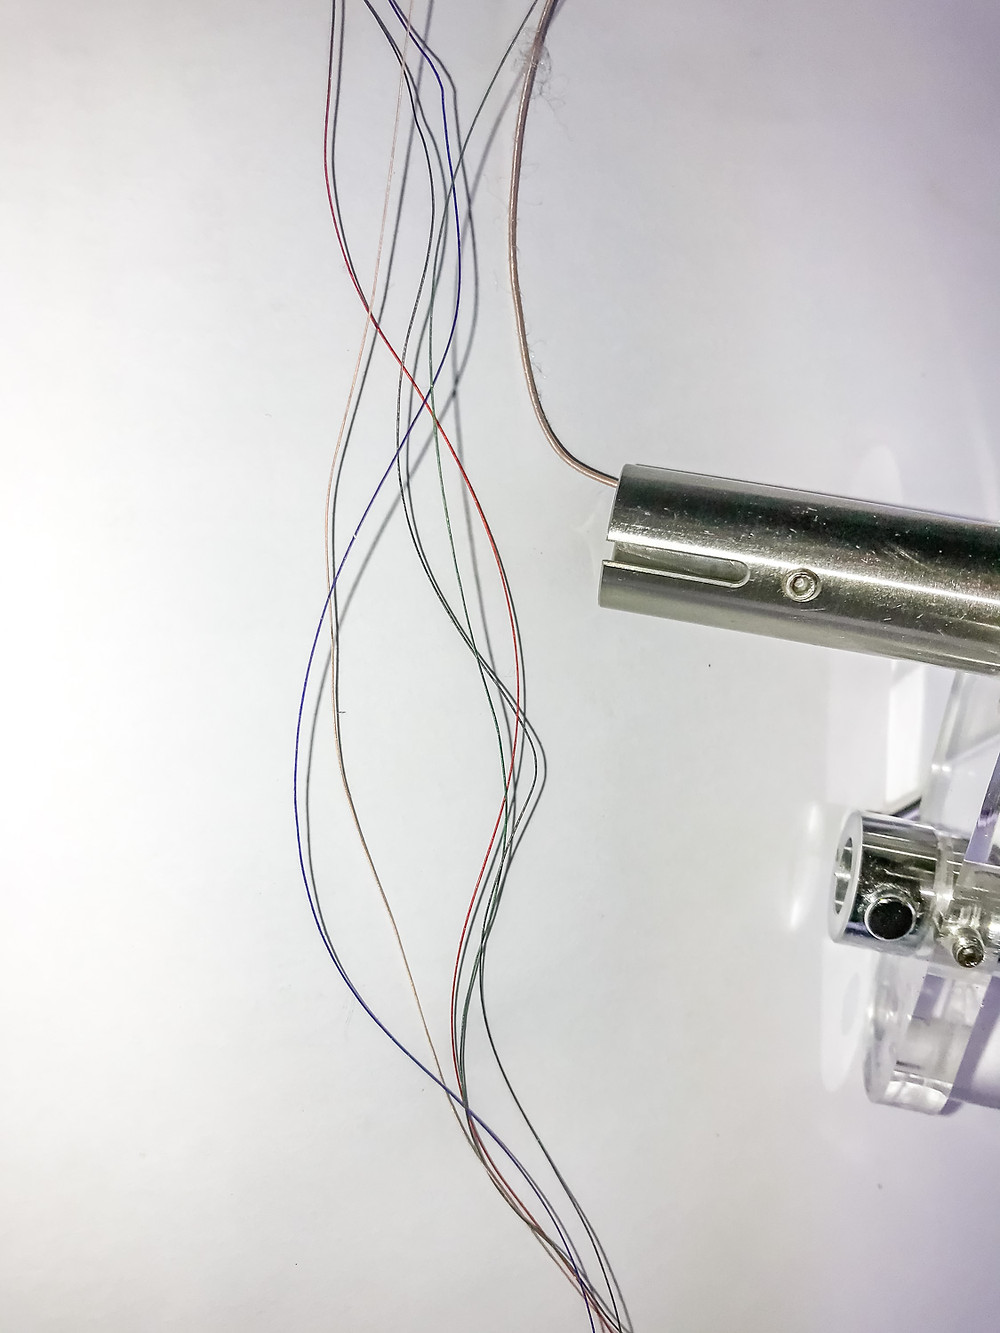 The Litz wires